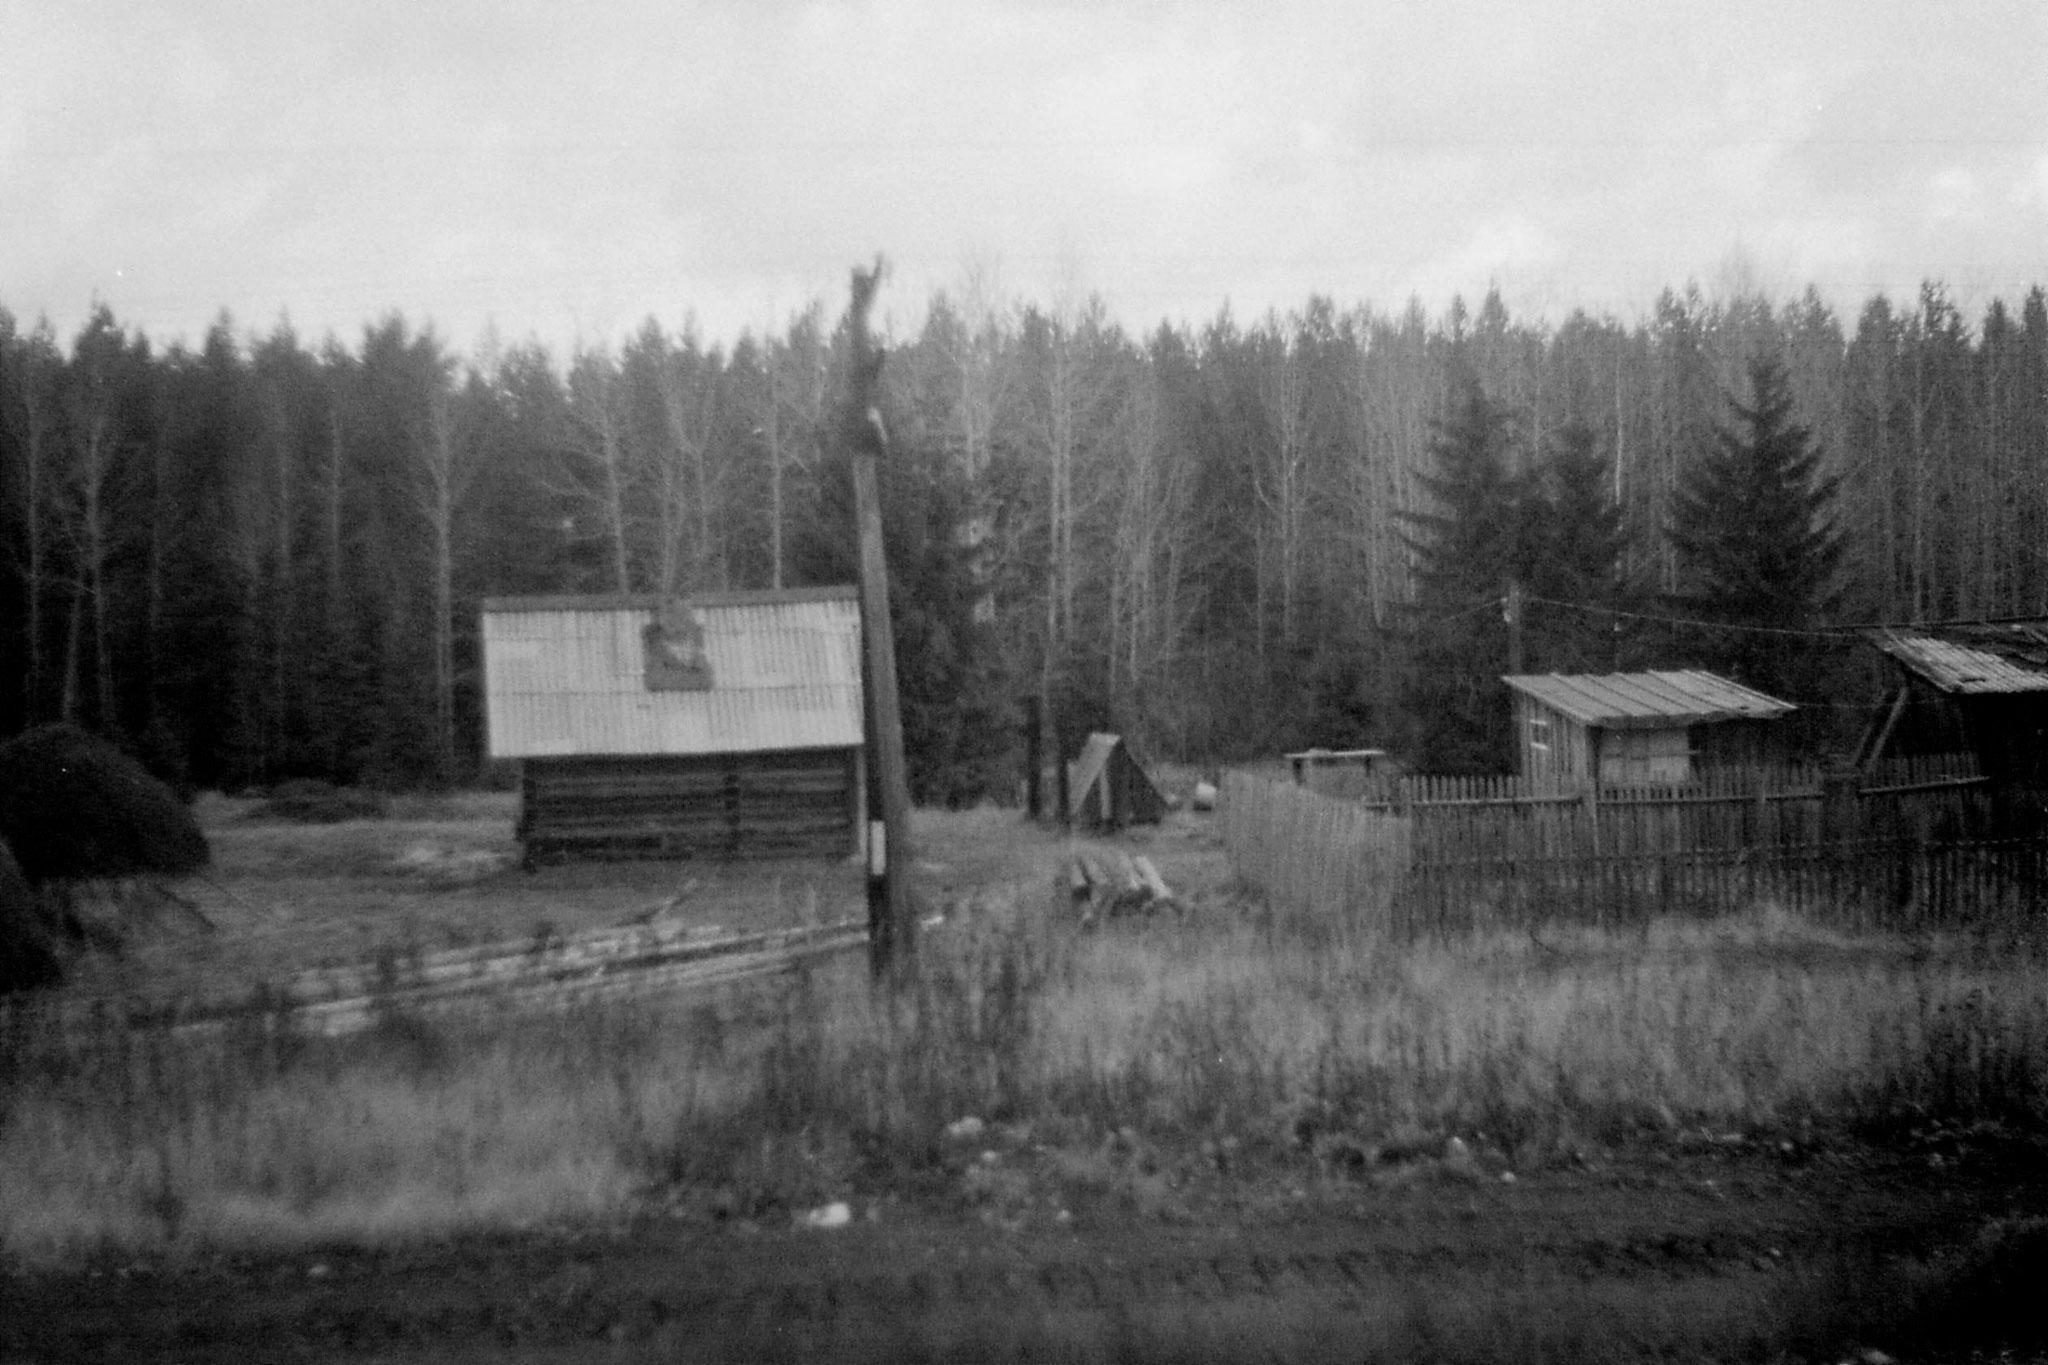 19/10/1988: 20: from Siberian Express between Balezino and Perm